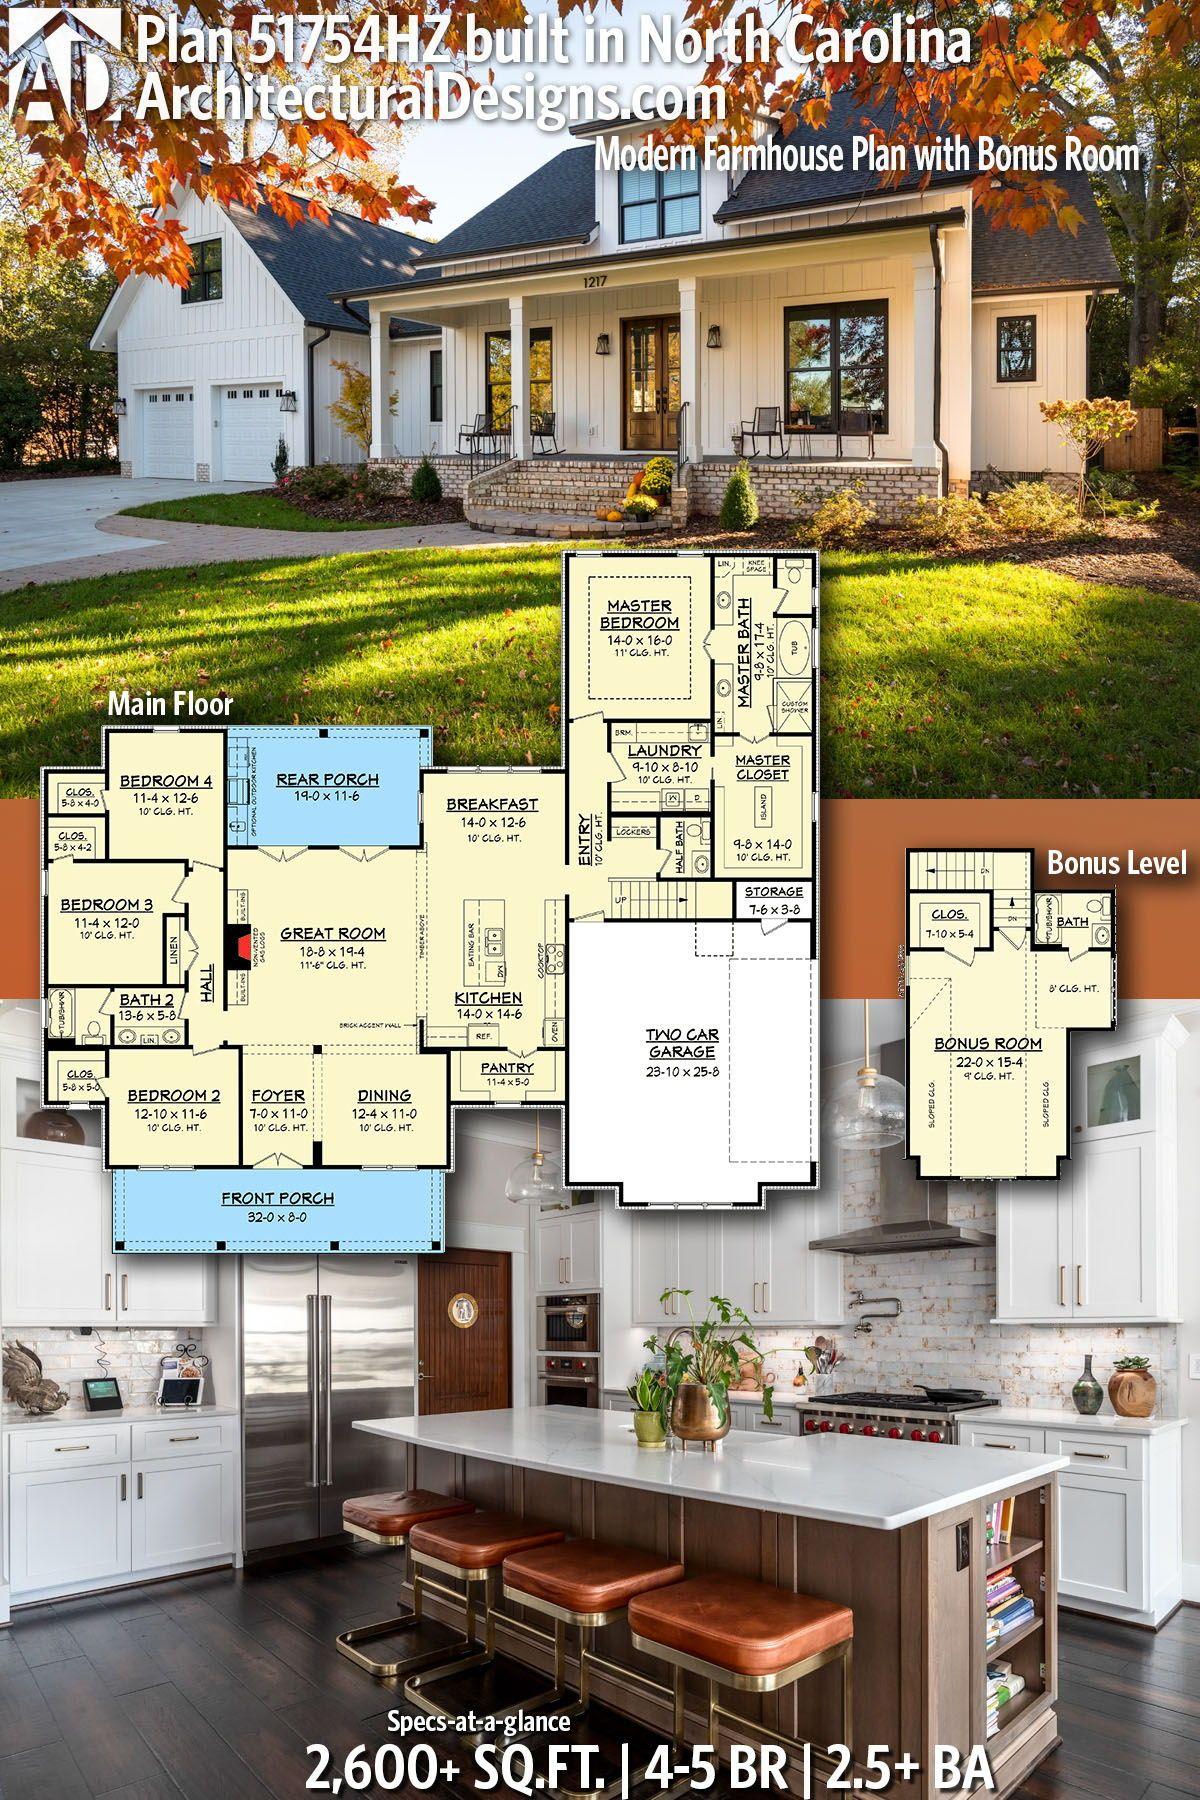 Plan HZ Modern Farmhouse Plan with Bonus Room